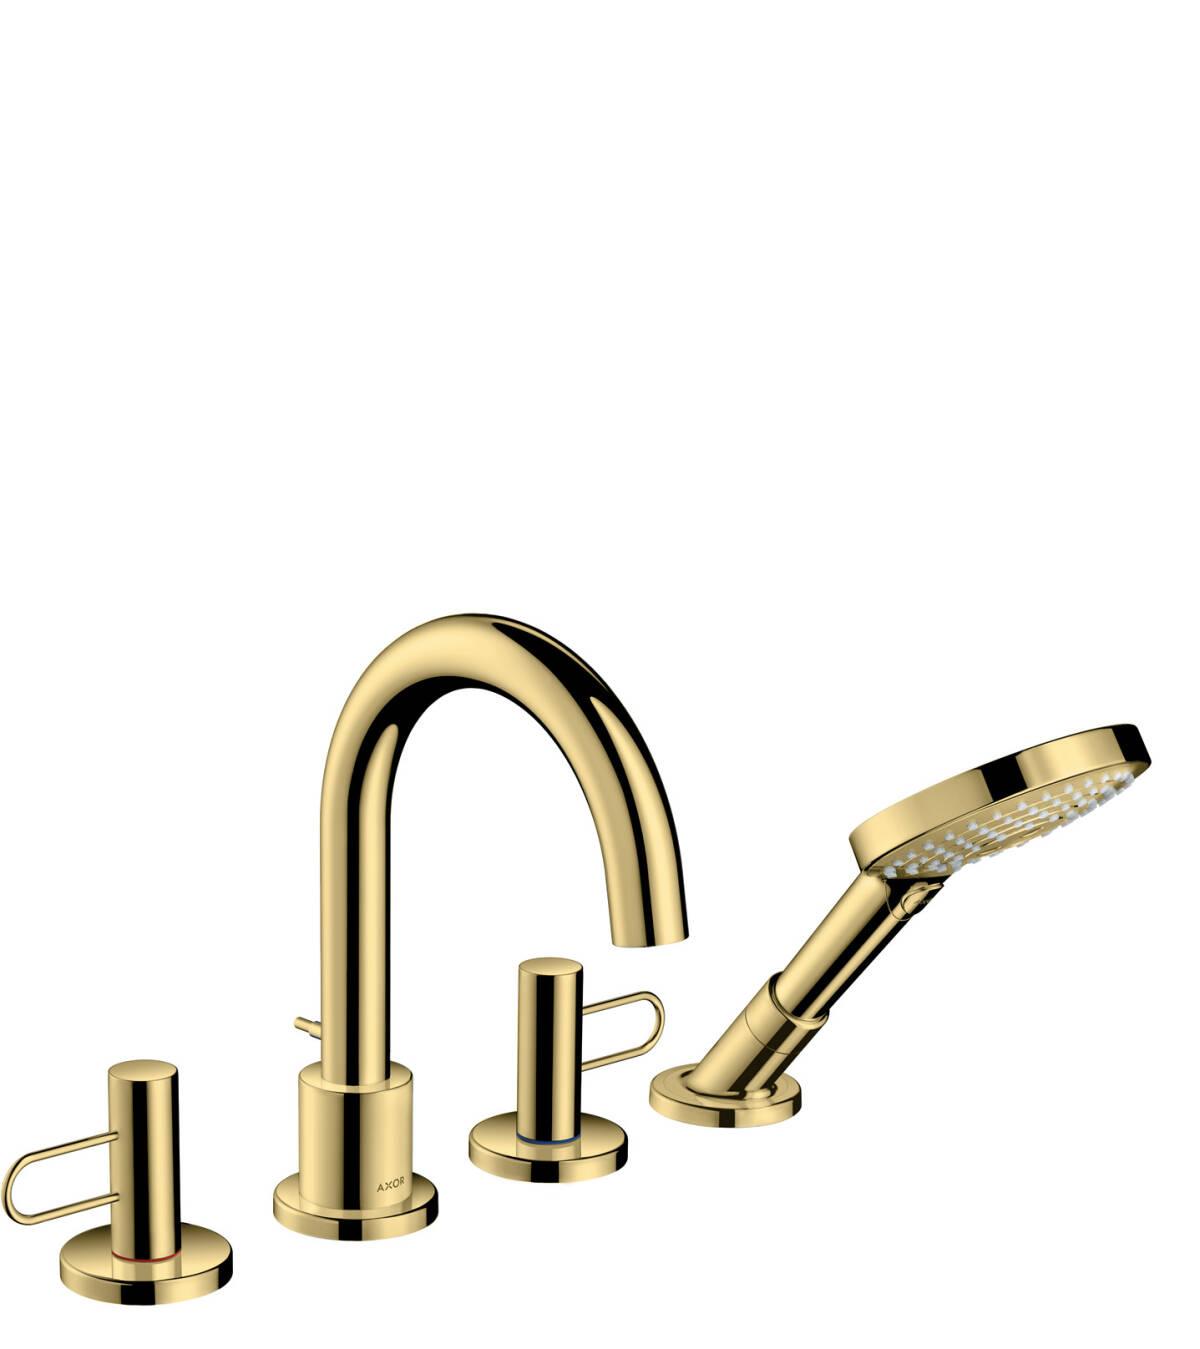 4-hole rim mounted bath mixer loop handle, Polished Brass, 38445930